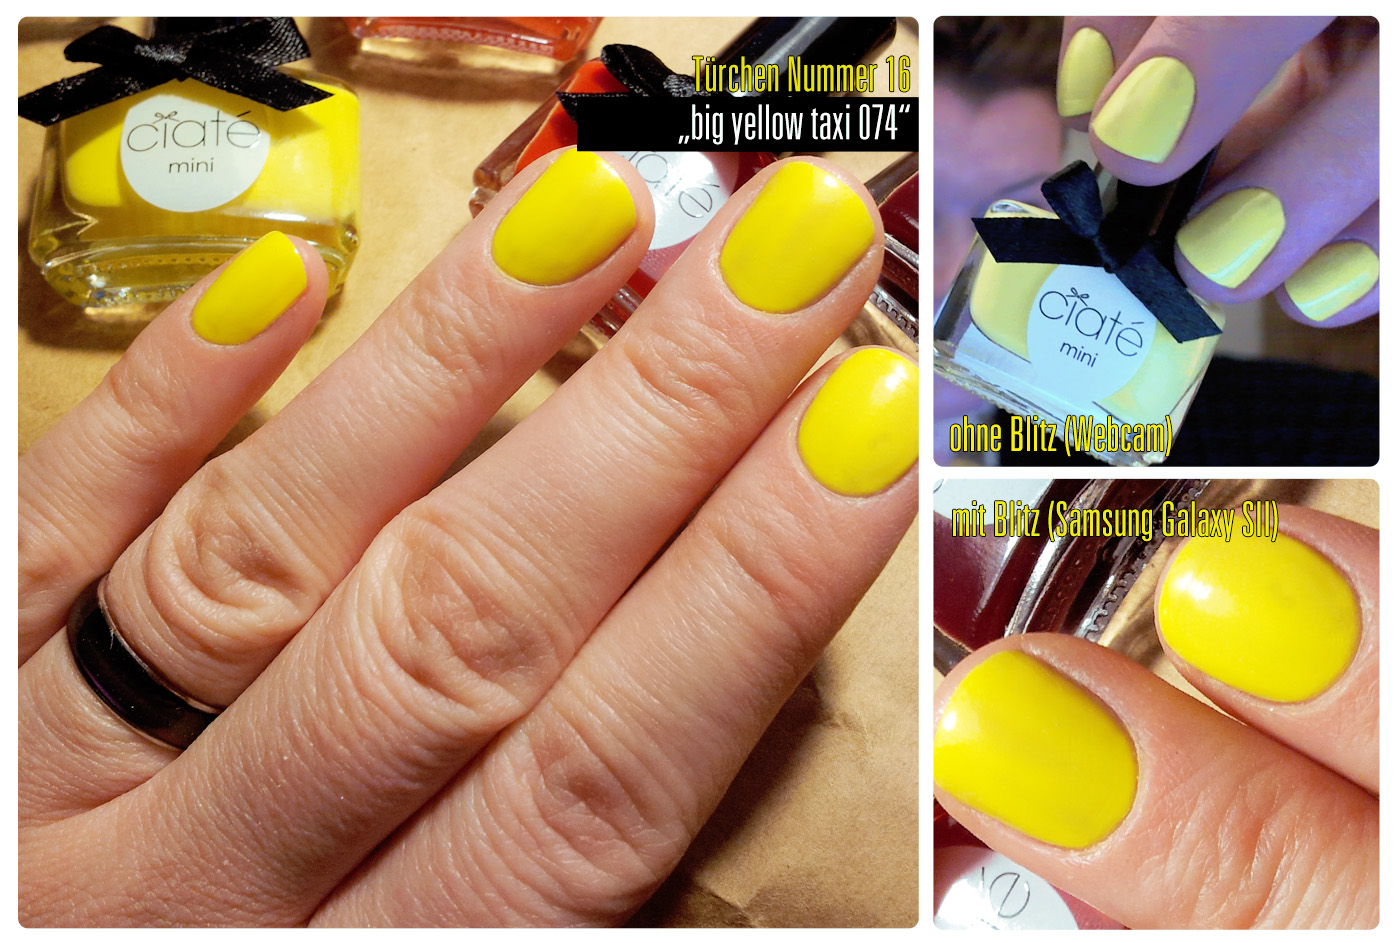 "Ciaté Adventskalender Mini Mani Month Nagellacke | Türchen Nummer 16: ""big yellow taxi 074"""